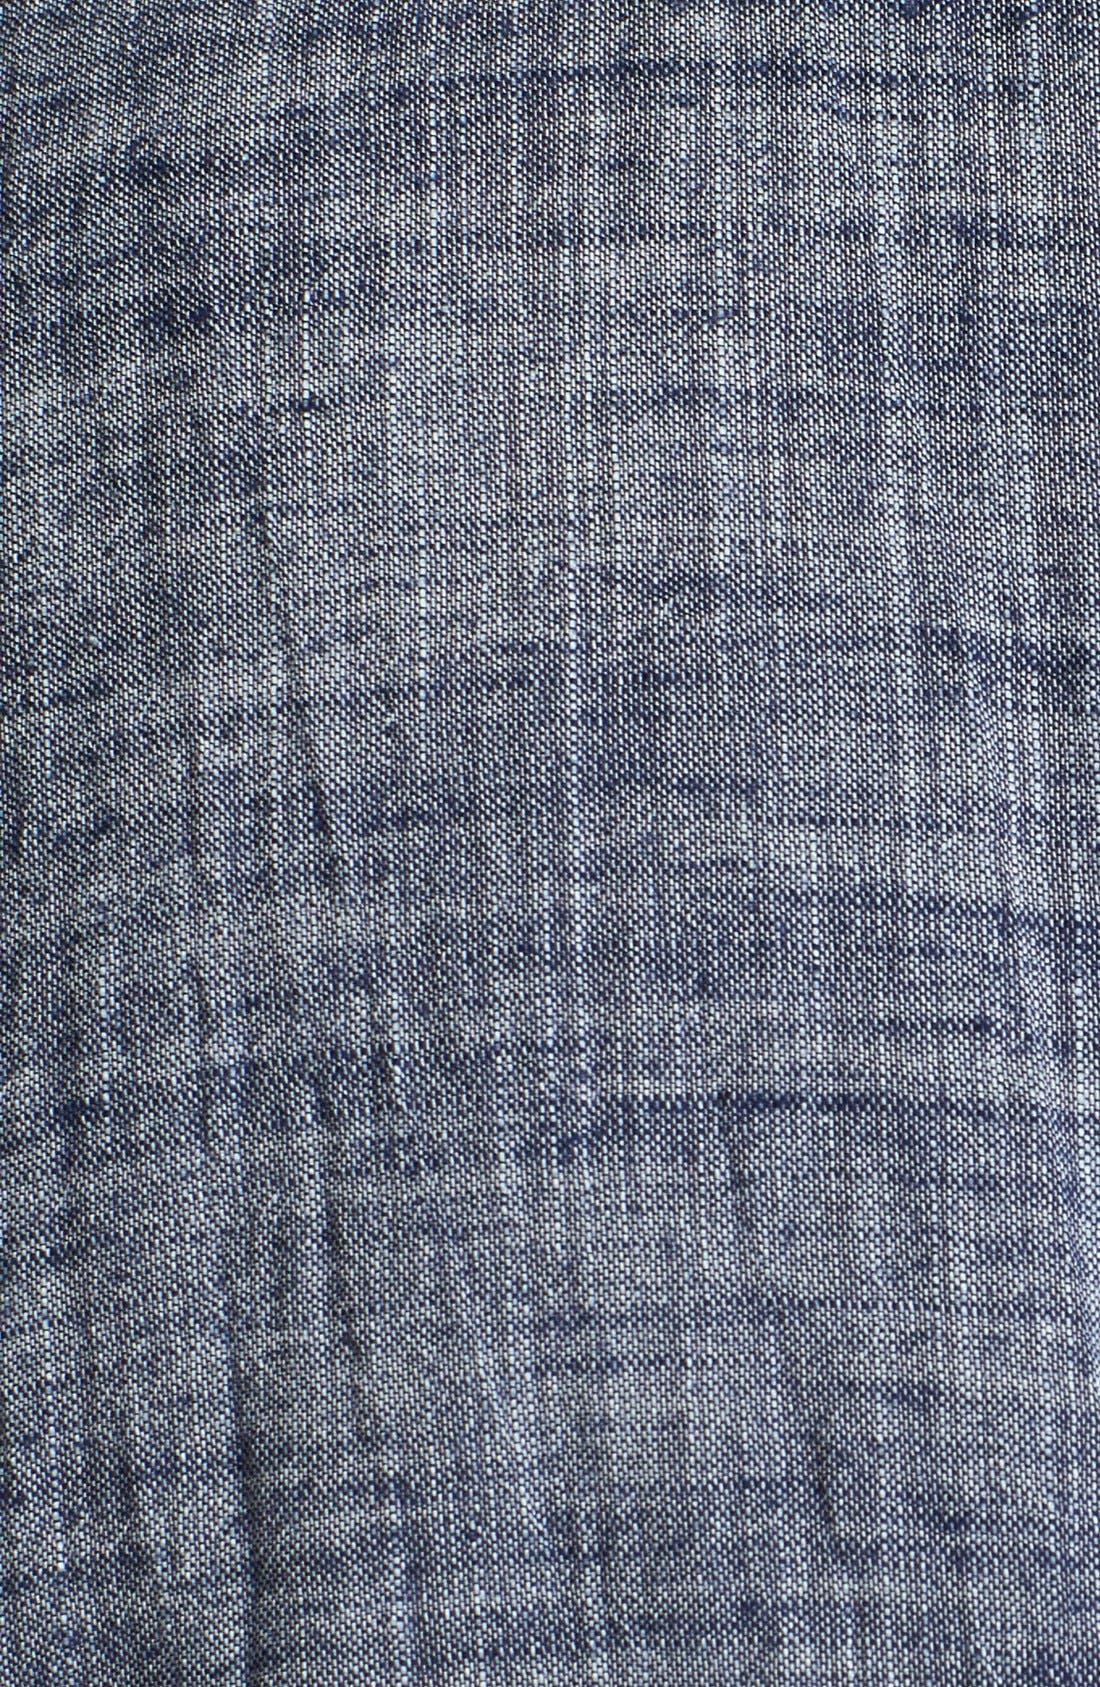 Alternate Image 2  - Billy Reid 'Donelson' Standard Fit Short Sleeve Chambray Shirt